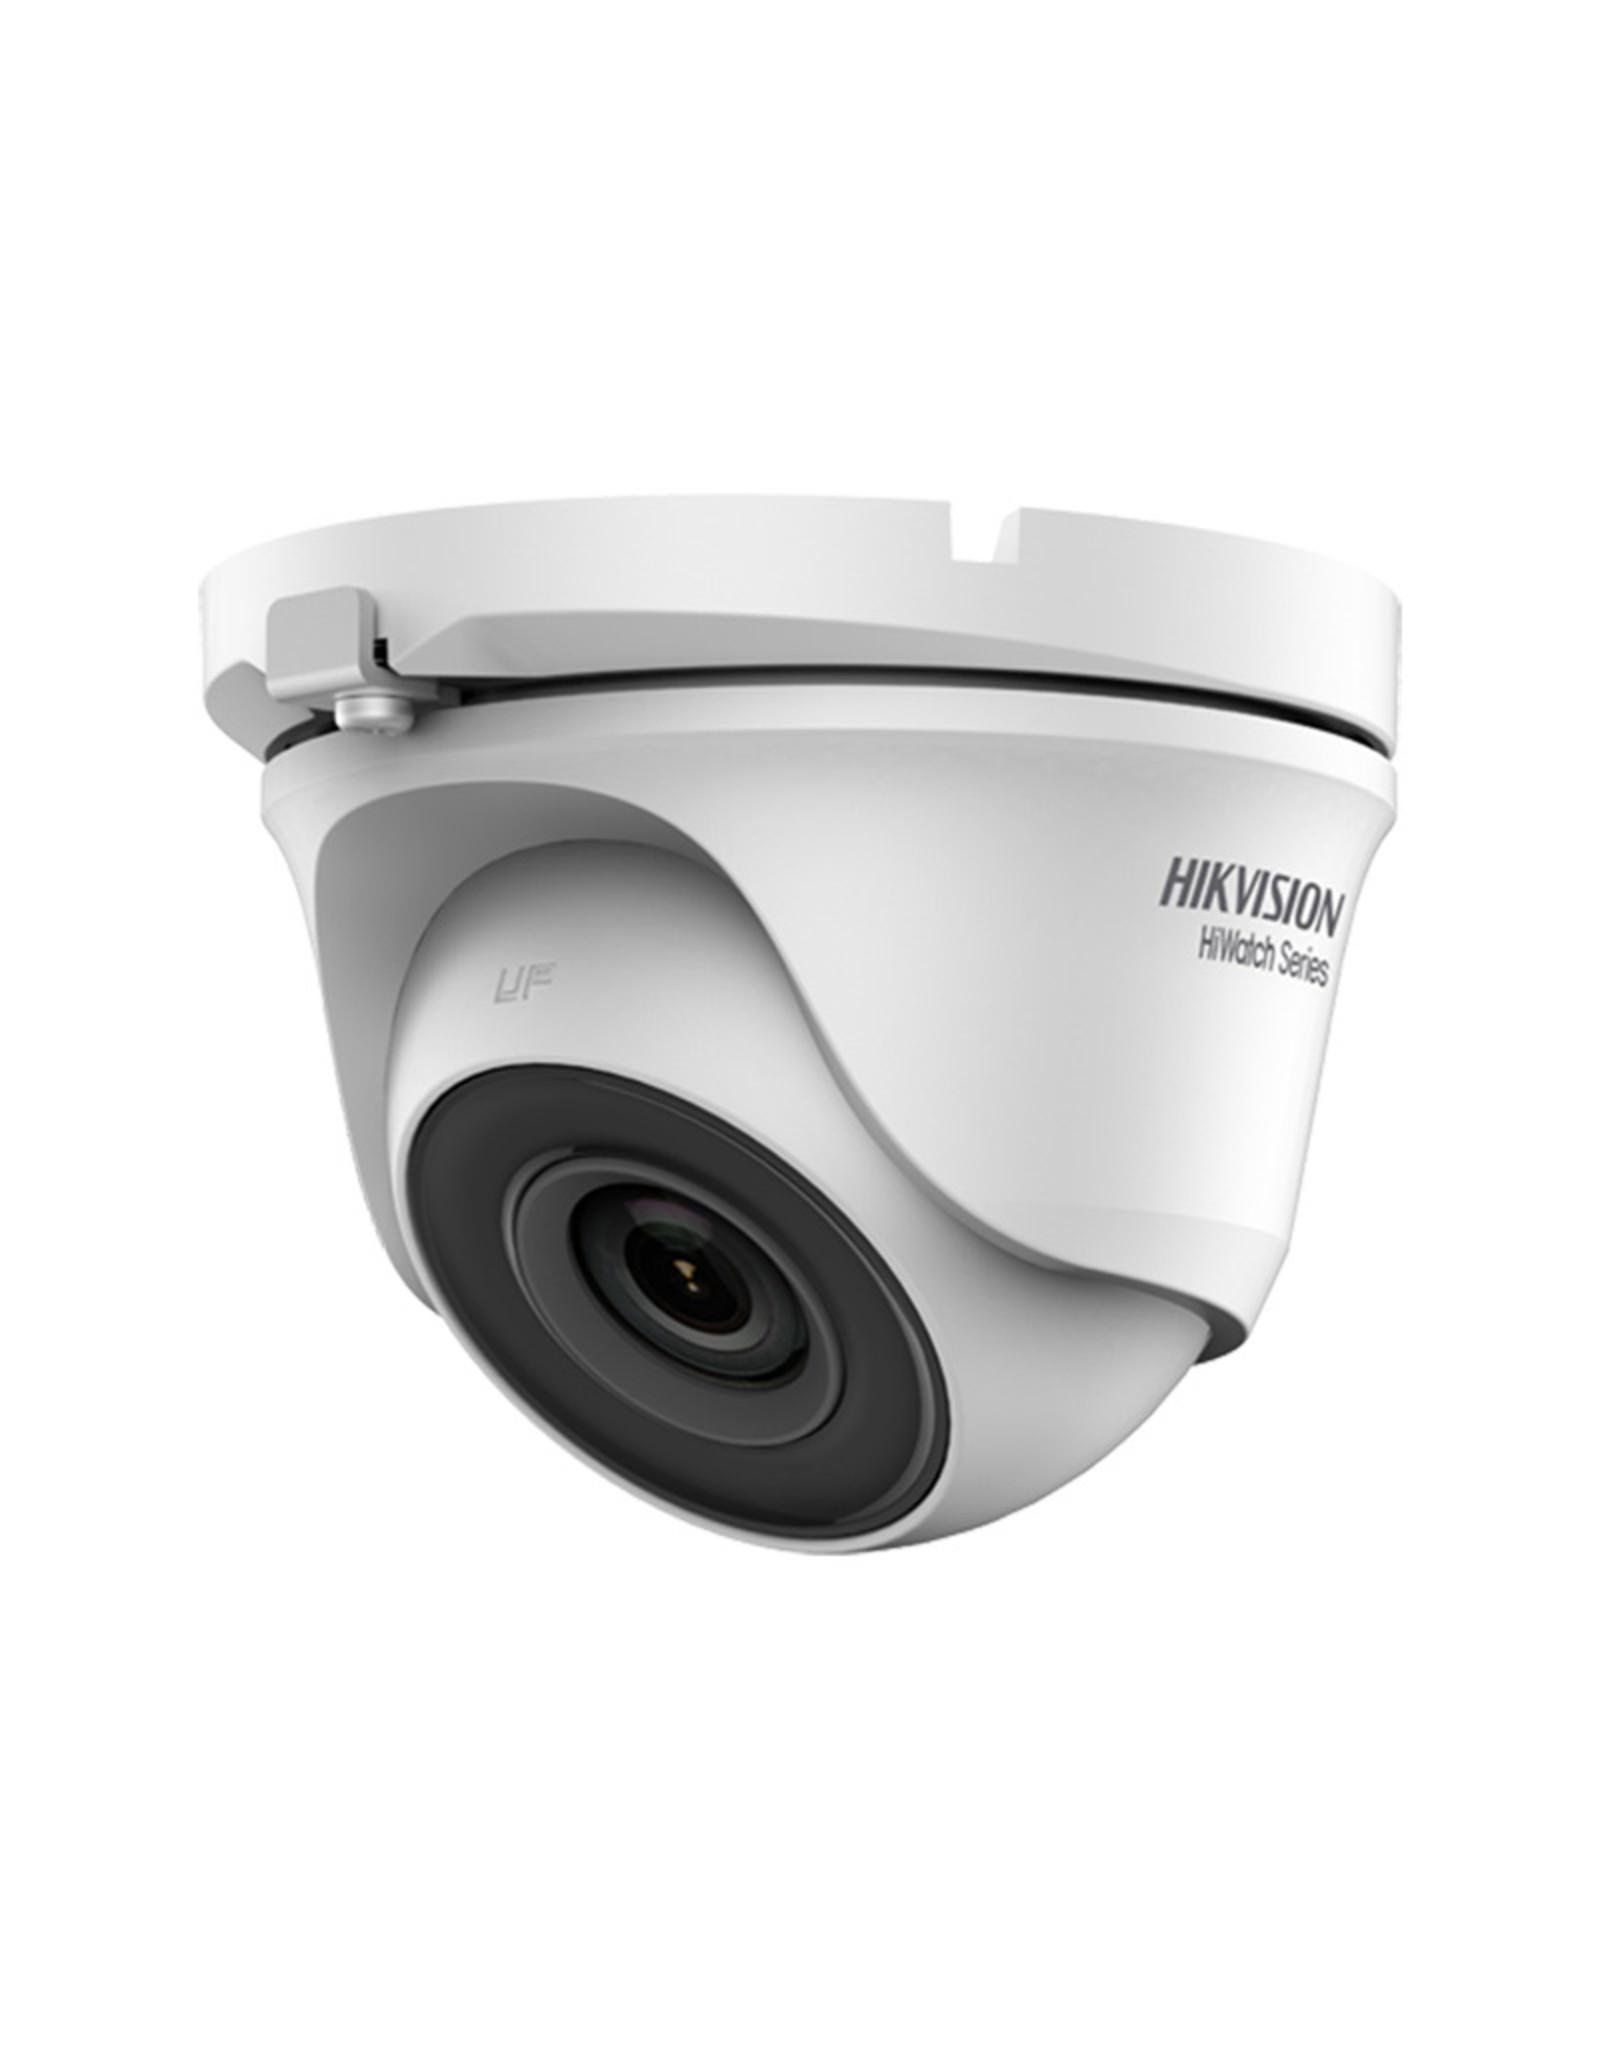 Hikvision Hikvision HWT-T123-M